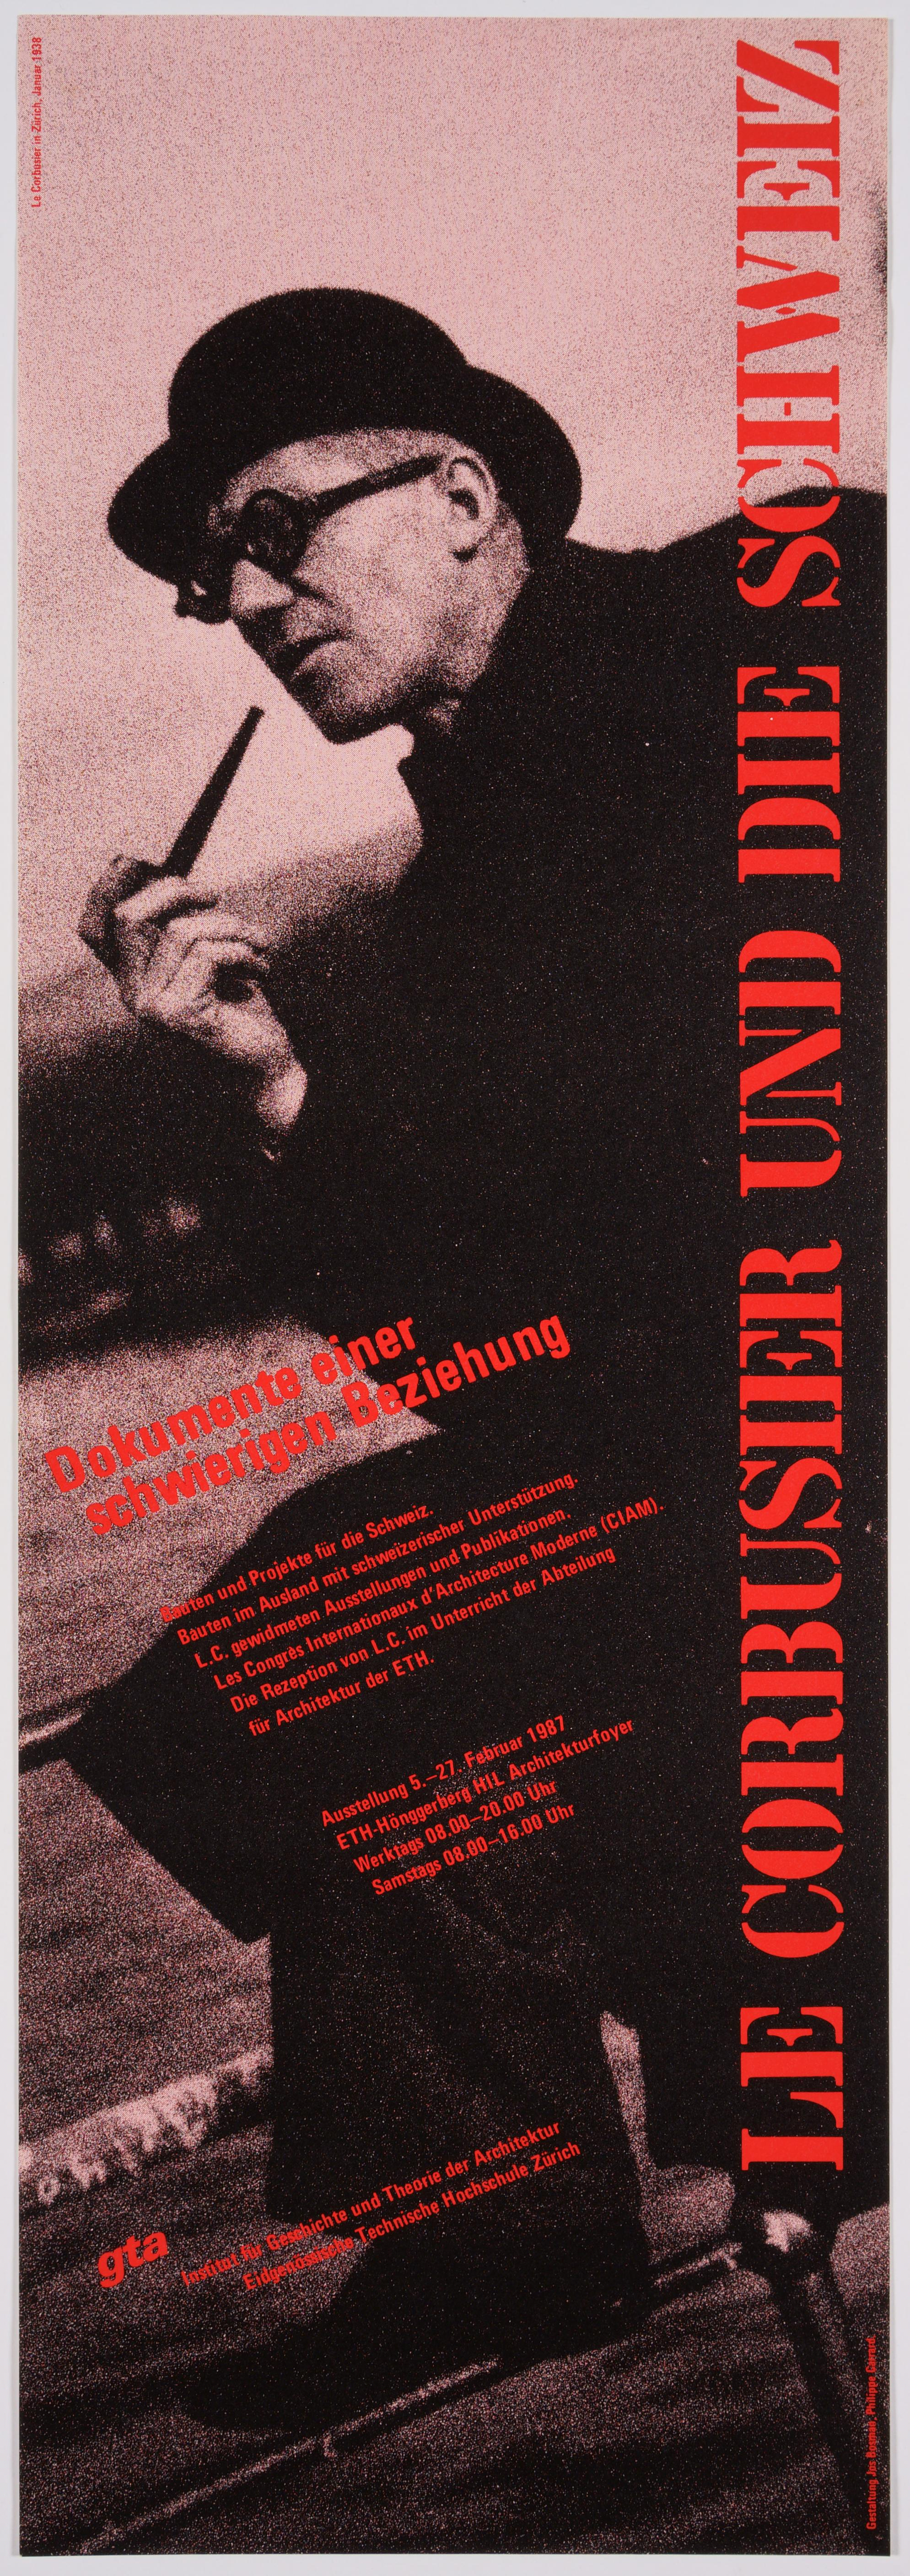 Original Exhibition Poster –Le Corbusier's difficult relation to Switzerland